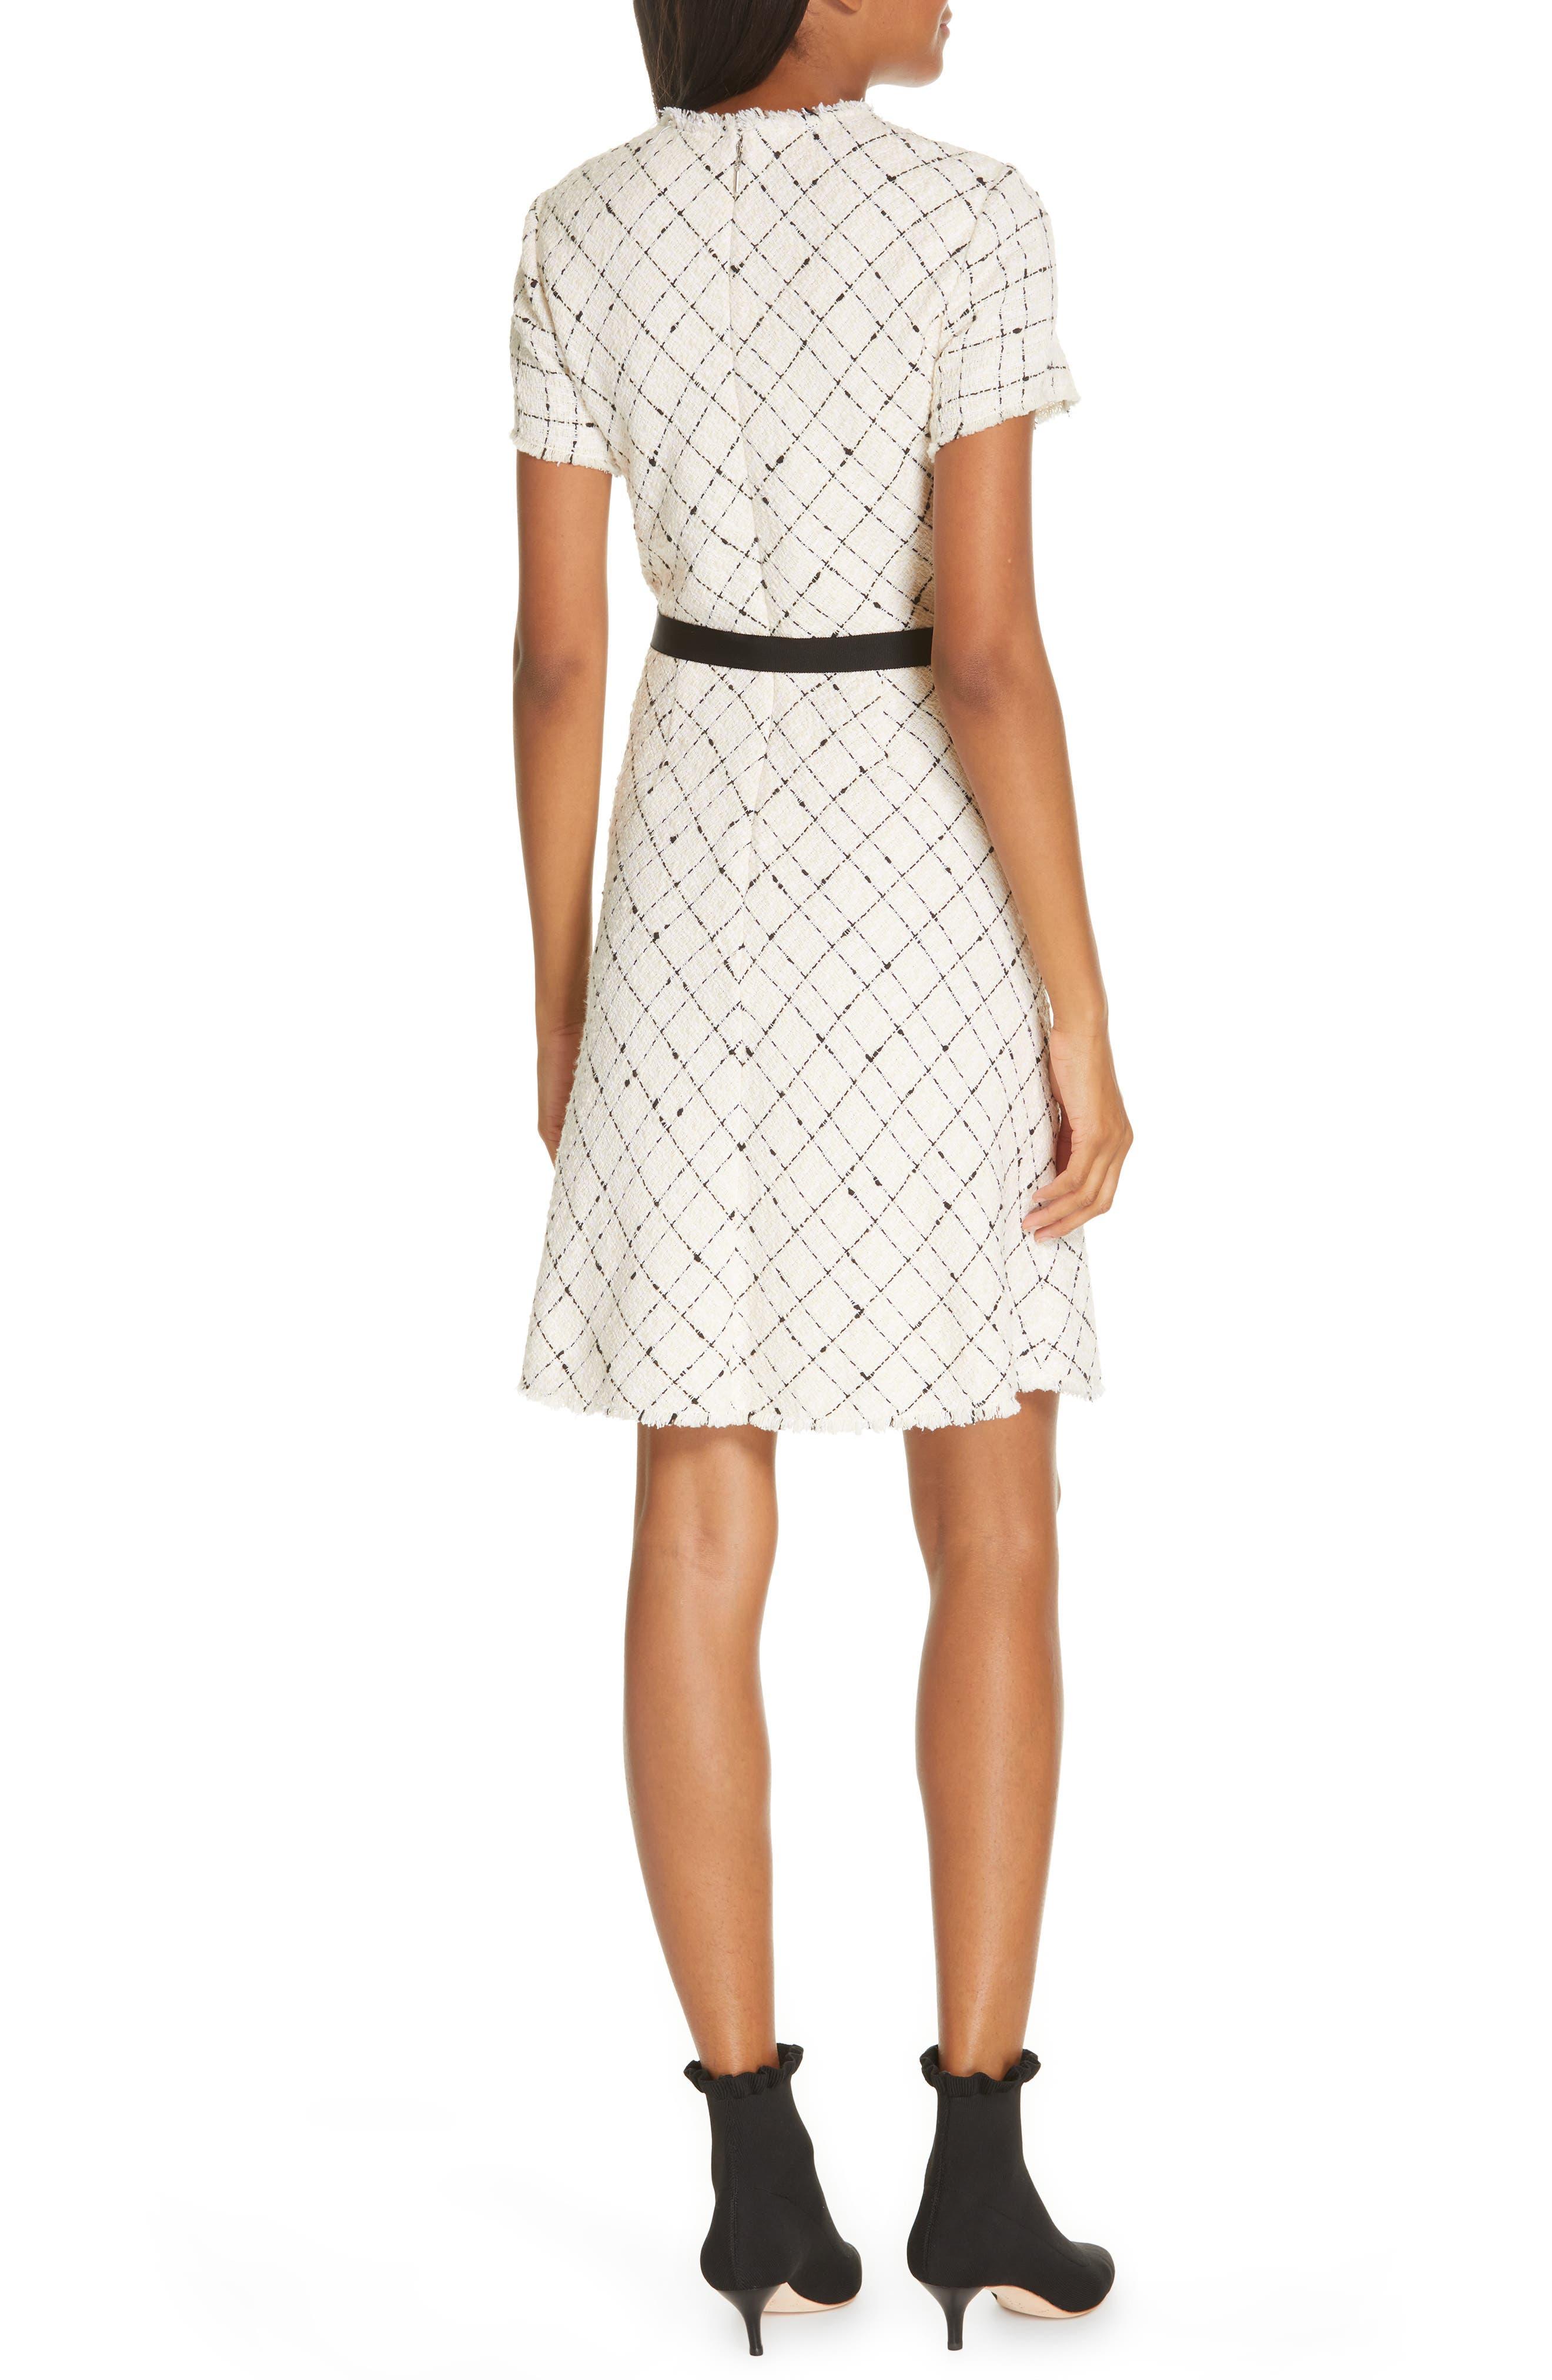 REBECCA TAYLOR, Plaid Tweed Dress, Alternate thumbnail 2, color, CREAM COMBO